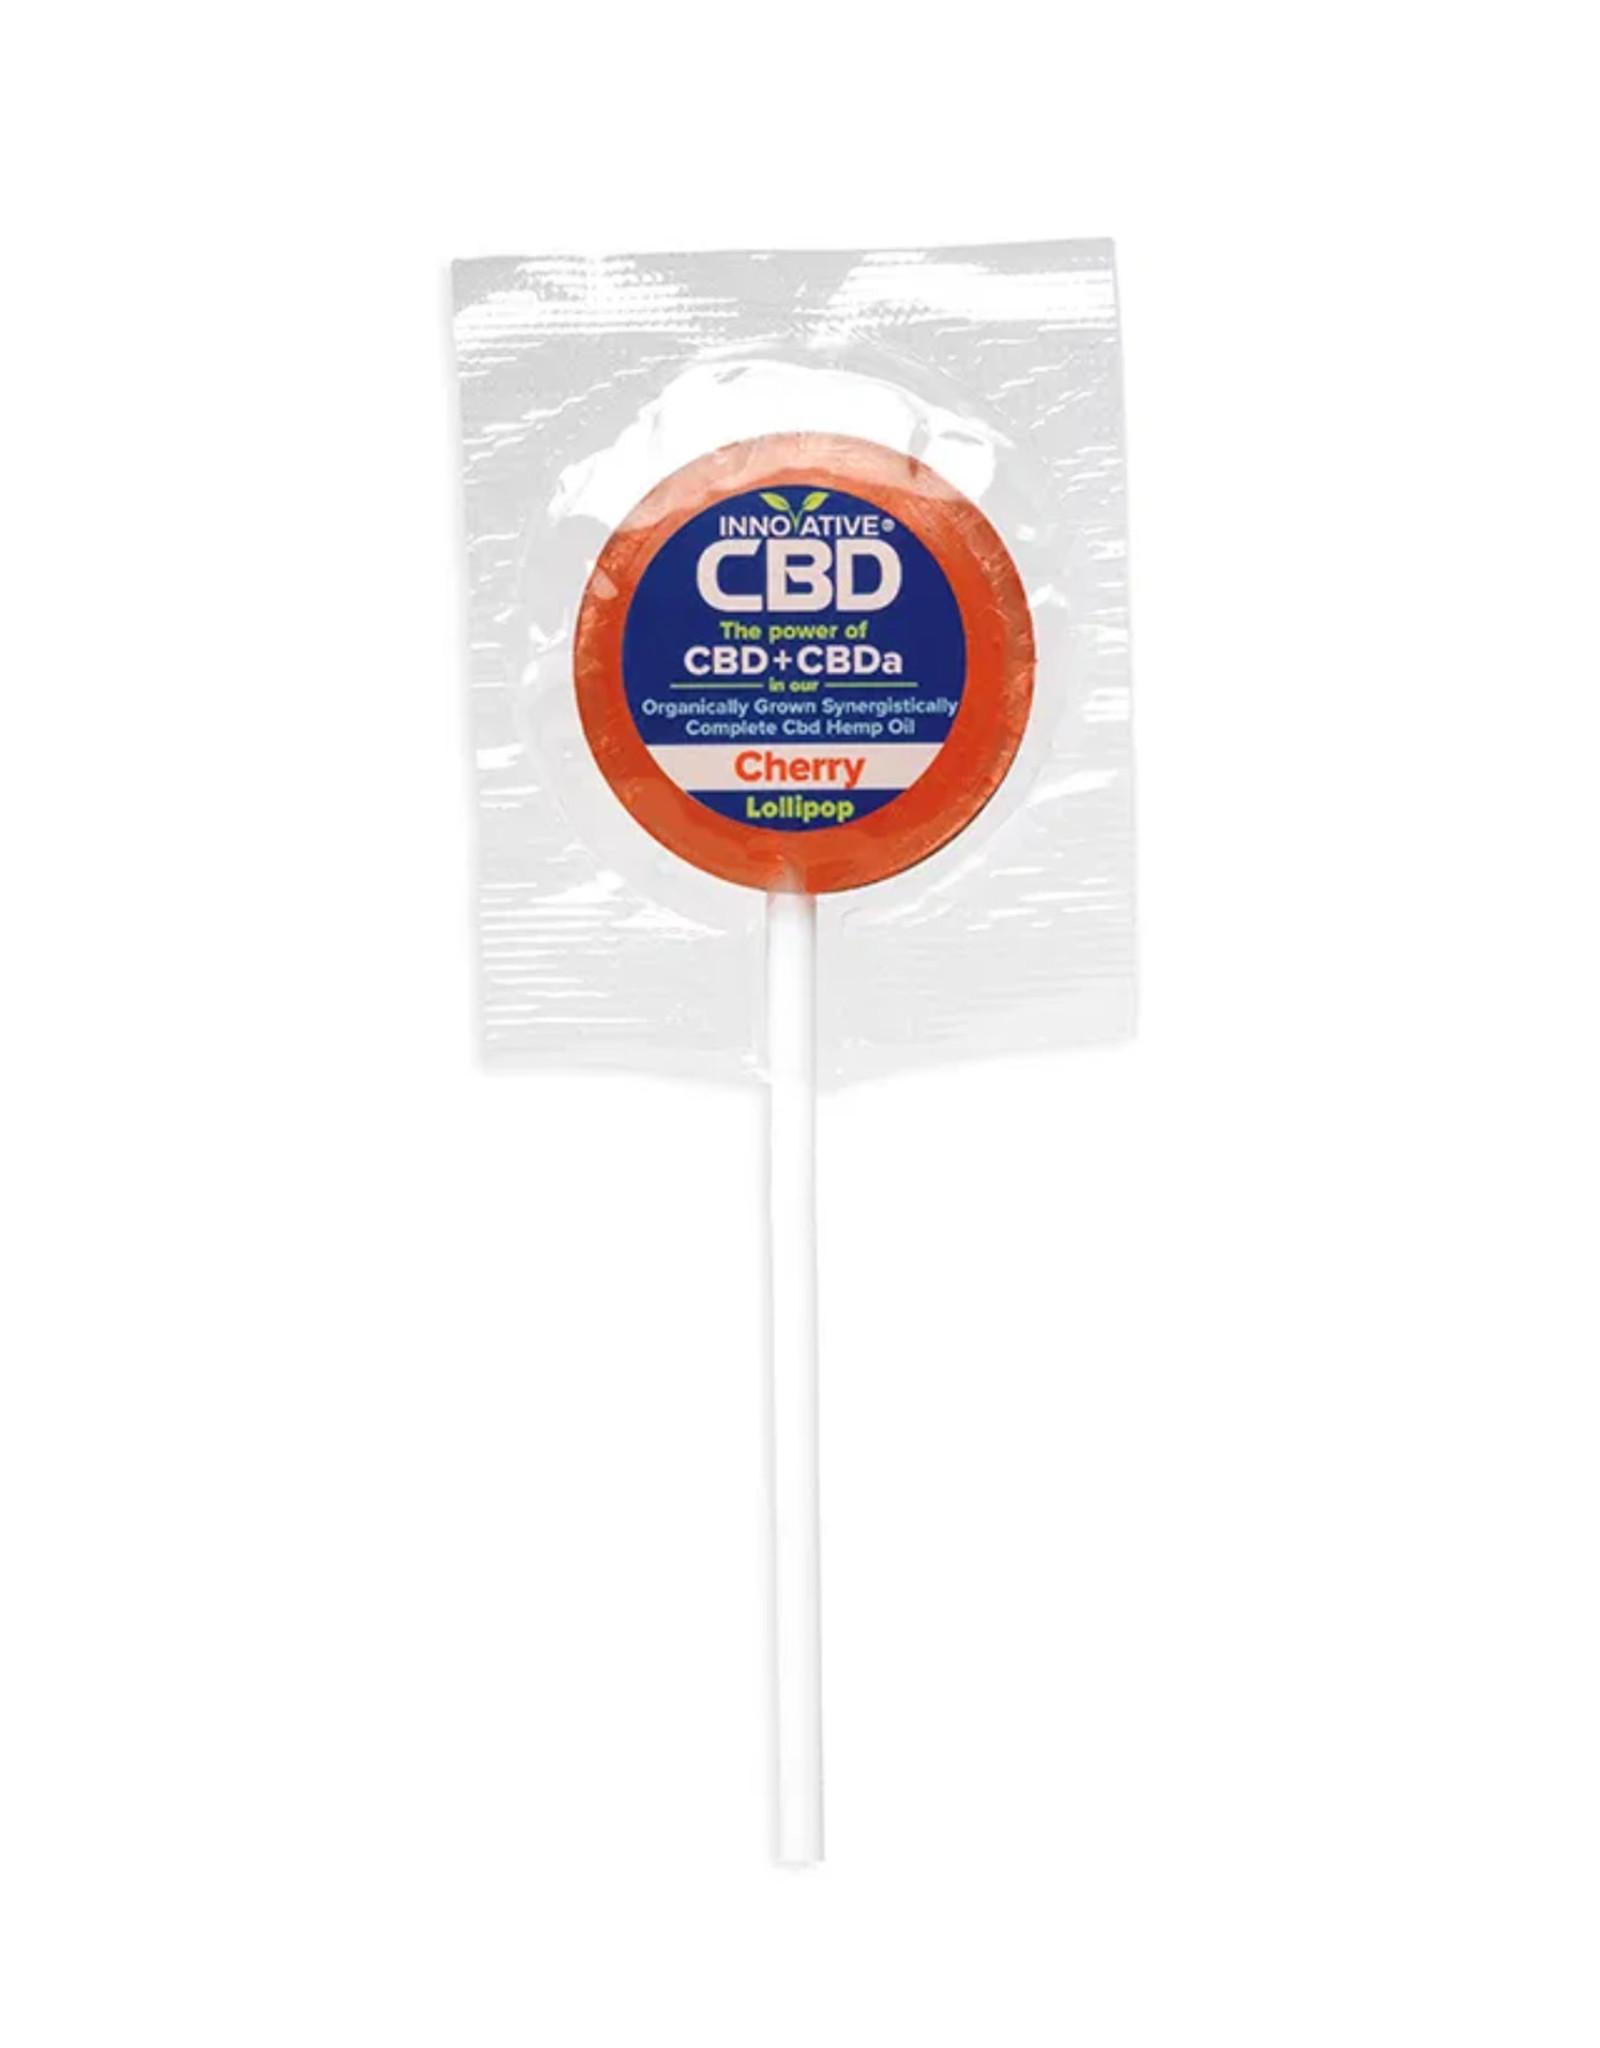 Innovative CBD 3mg CBD Cherry Lollipop